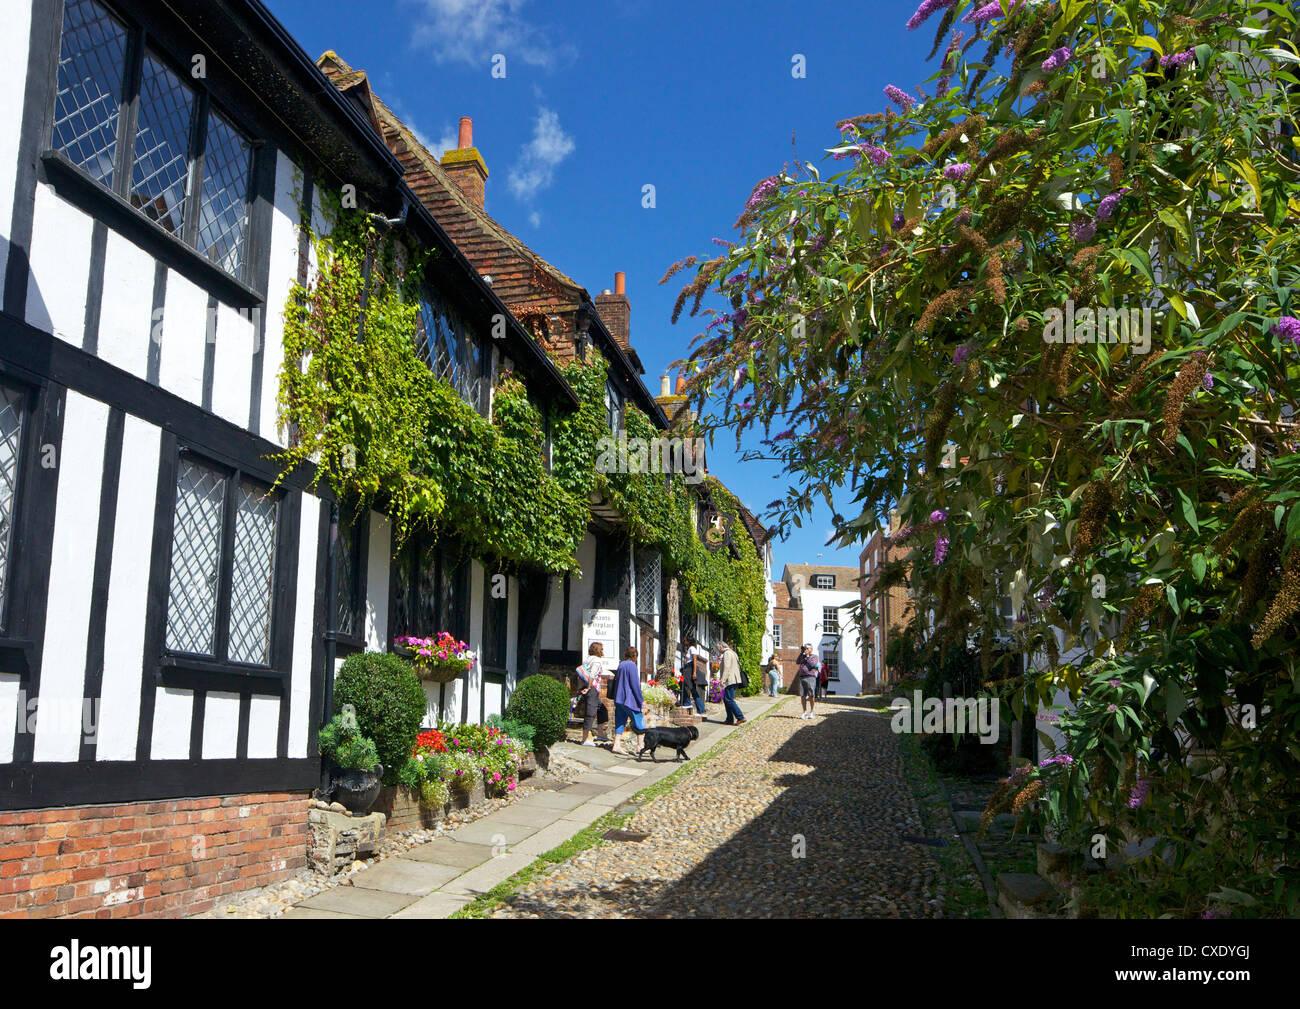 Die Mermaid Inn, Mermaid Street, Roggen, East Sussex, England, Vereinigtes Königreich, Europa Stockbild